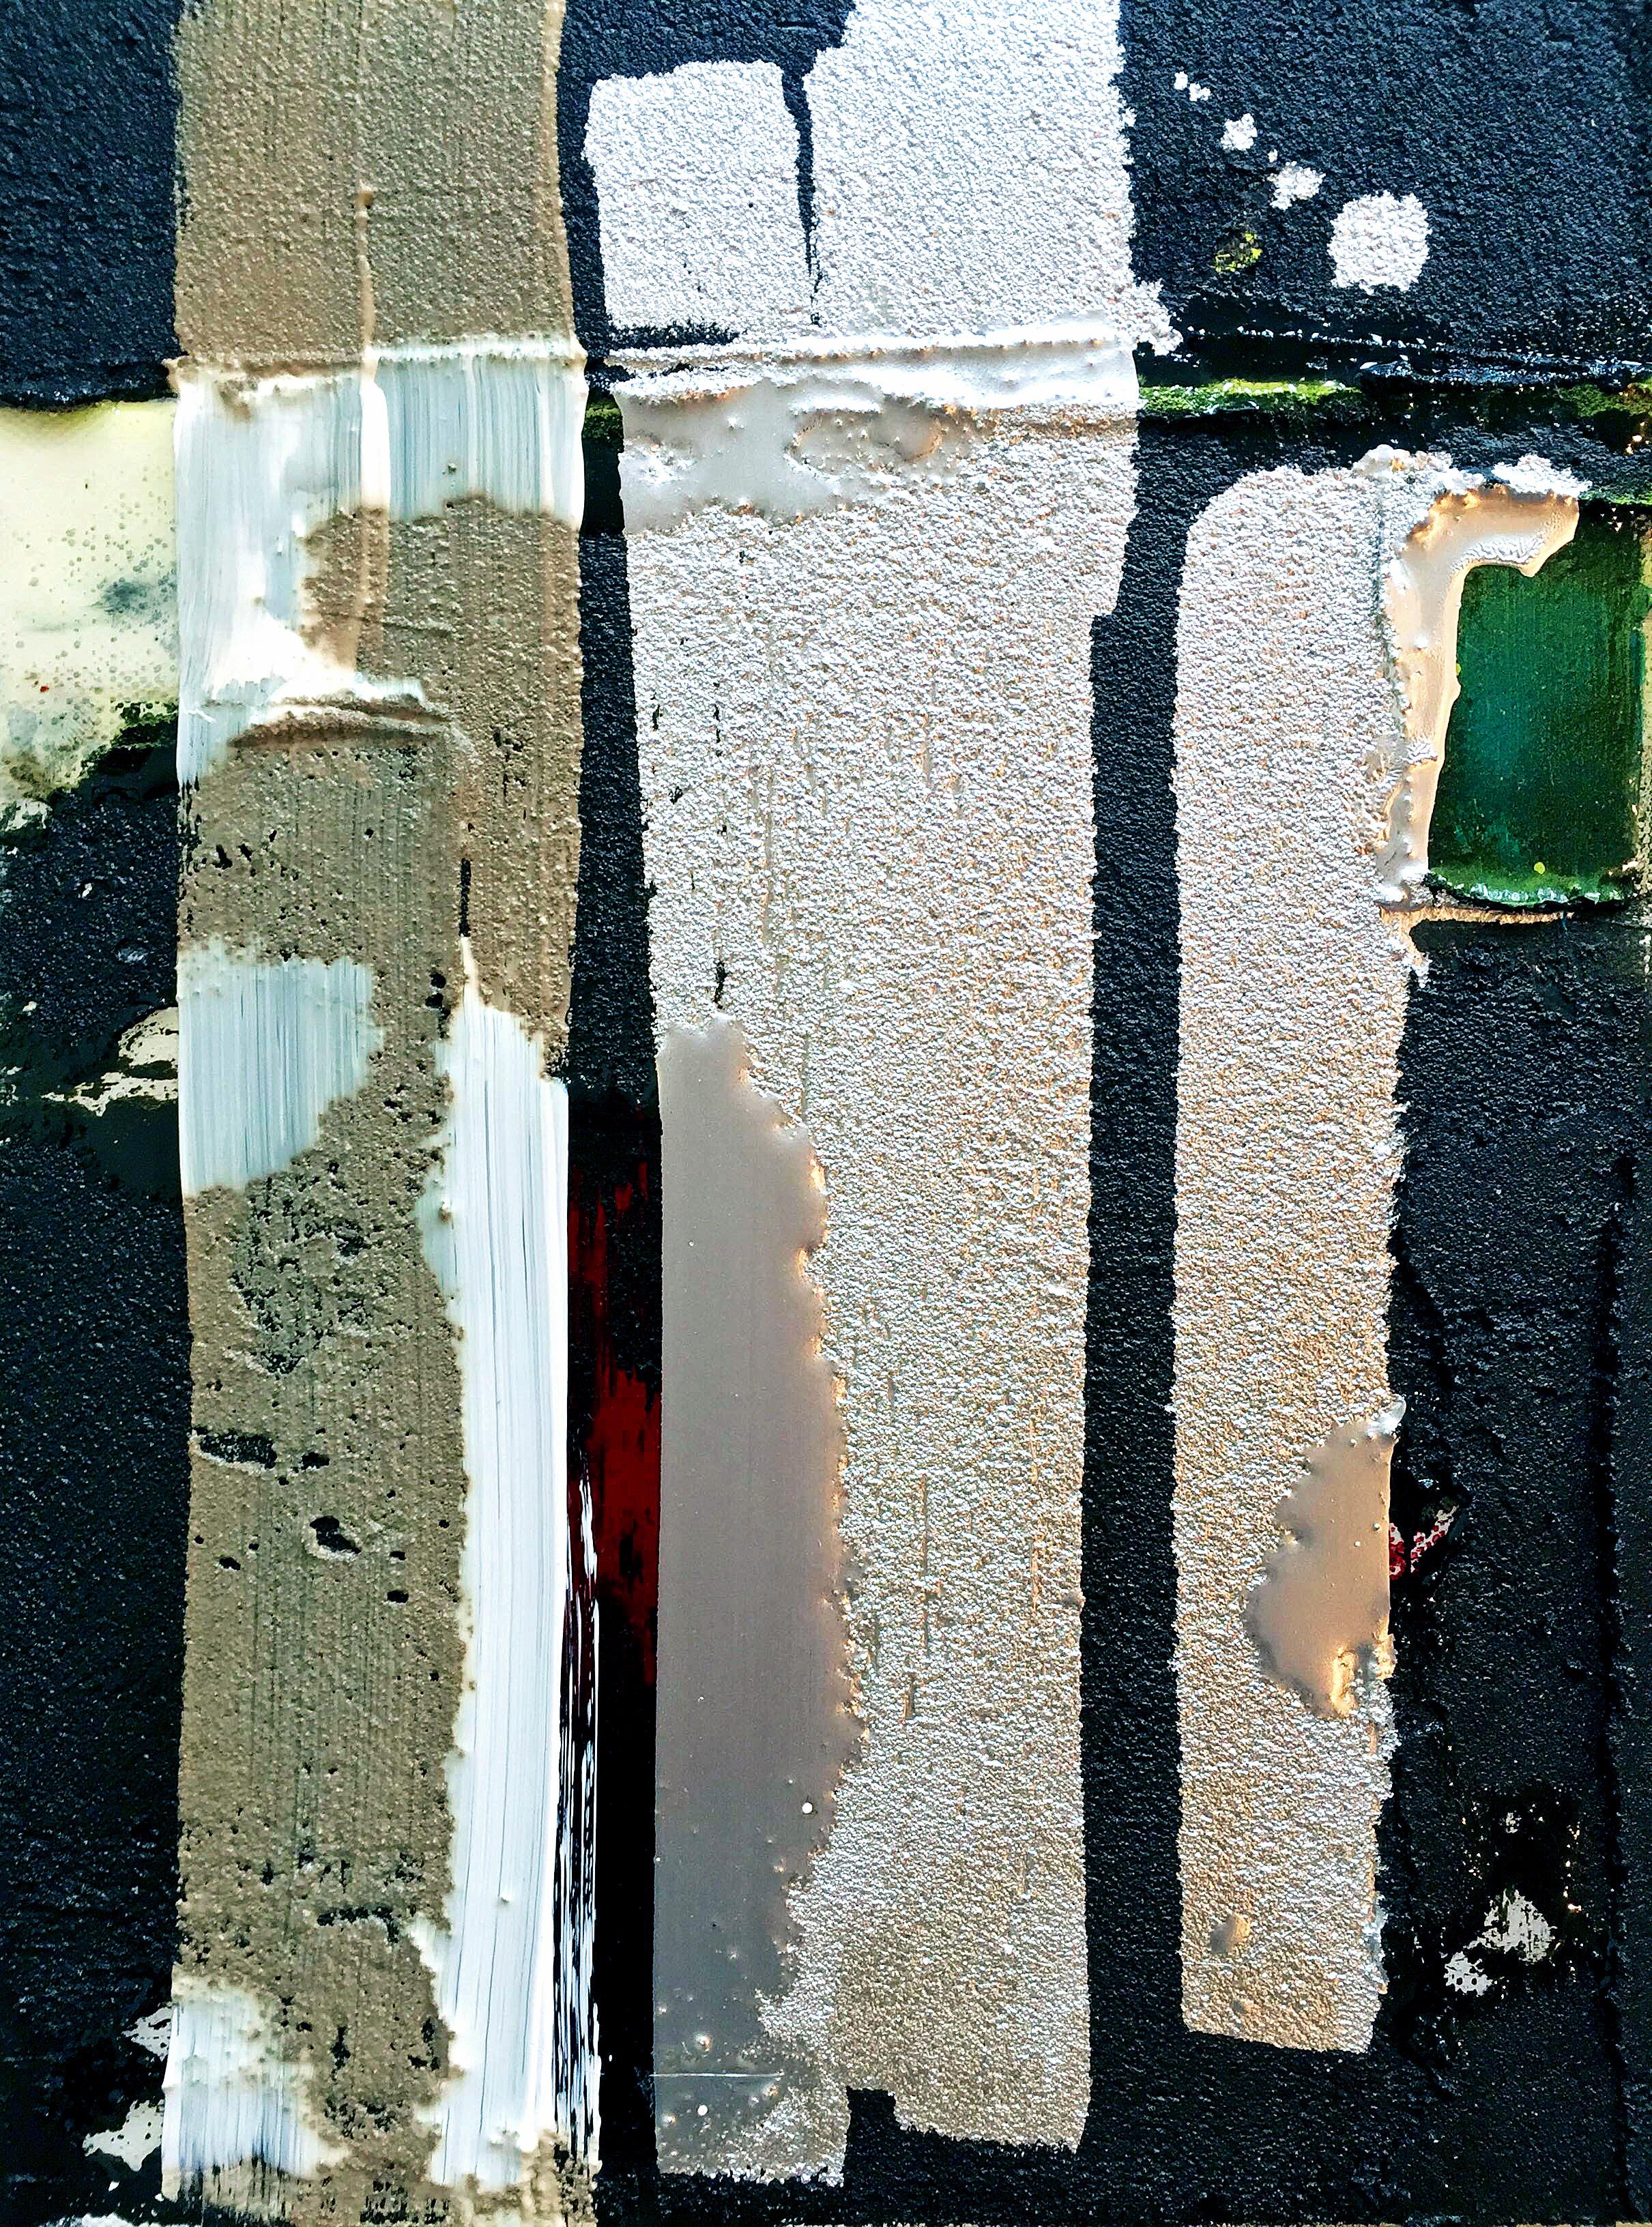 Mixed Media / Divergence XXXI /Oil, aluminum paint, asphalt, resin on canvas / 11 x 14 inches